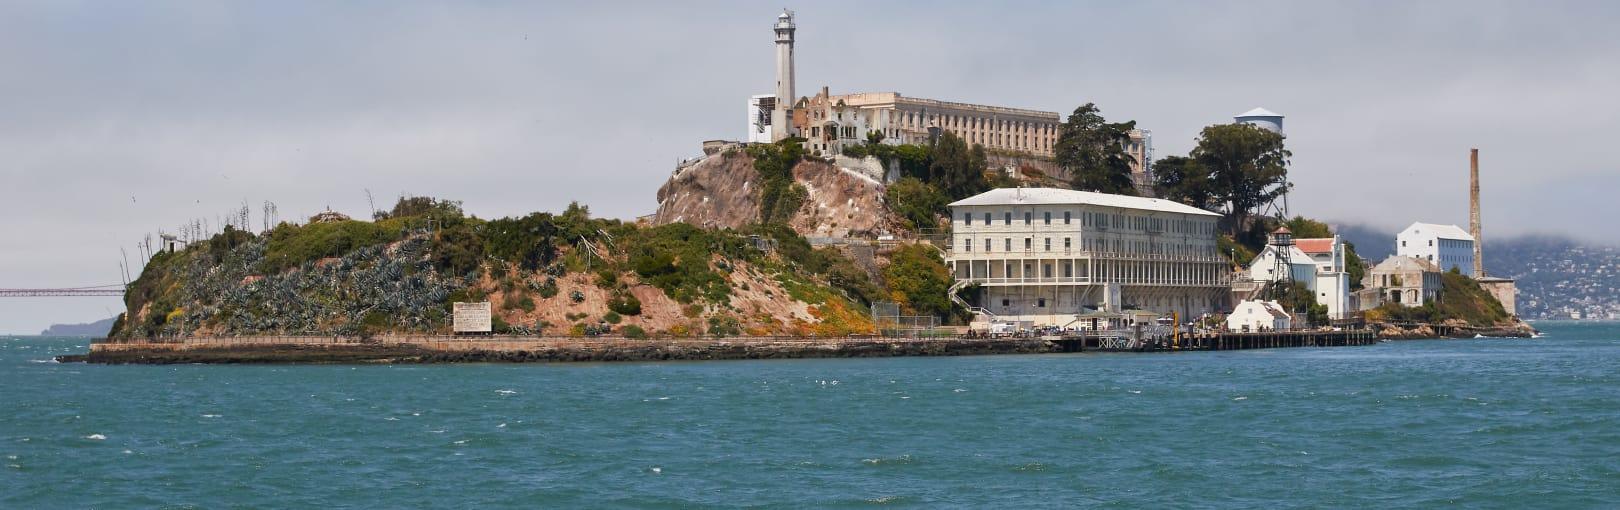 Alcatraz Bikes and Tours